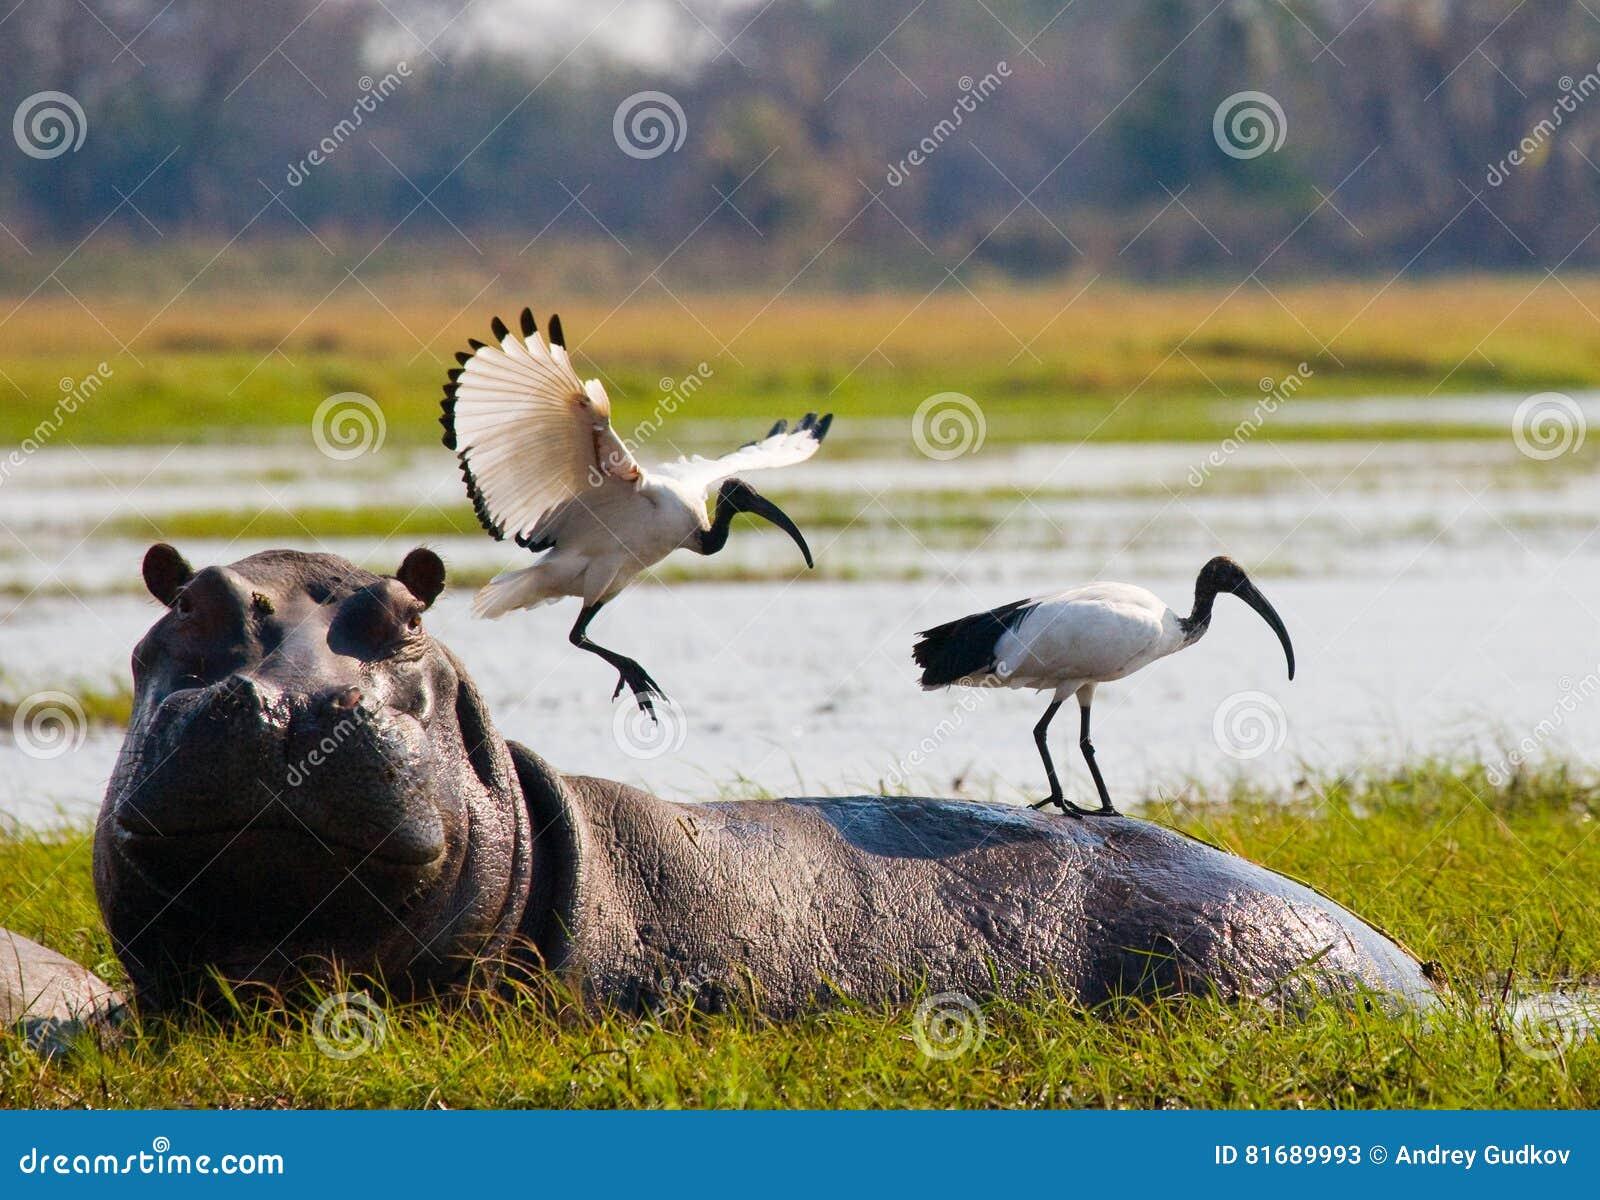 Birds are sitting on the back of a hippopotamus. Botswana. Okavango Delta.